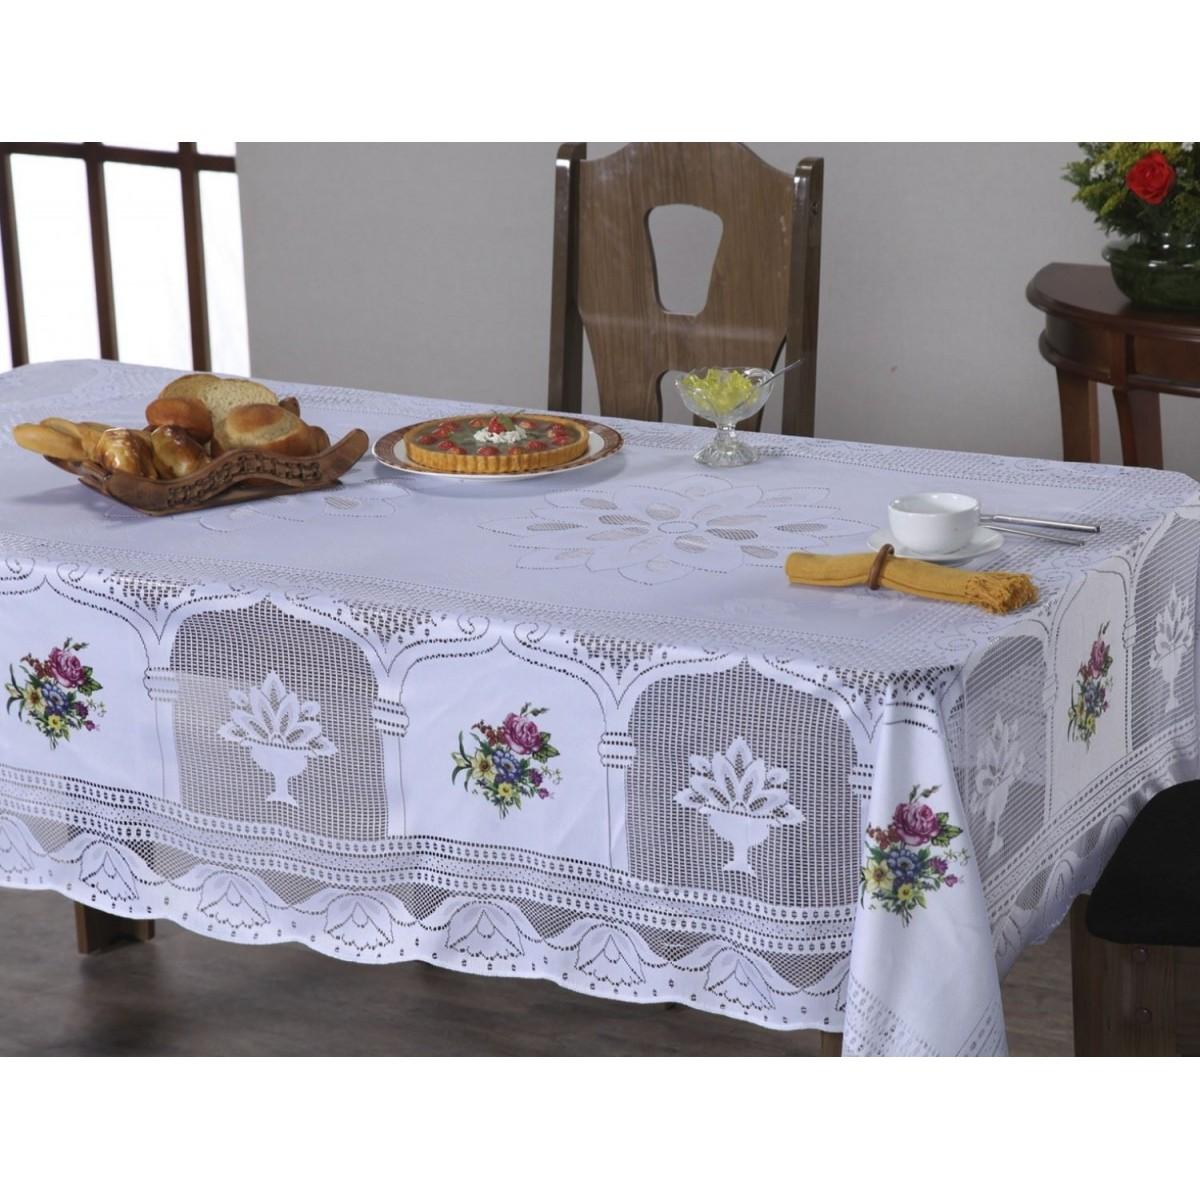 Toalha de Mesa Renda com Transfer 2,20m x 1,60m Suzi - Branco